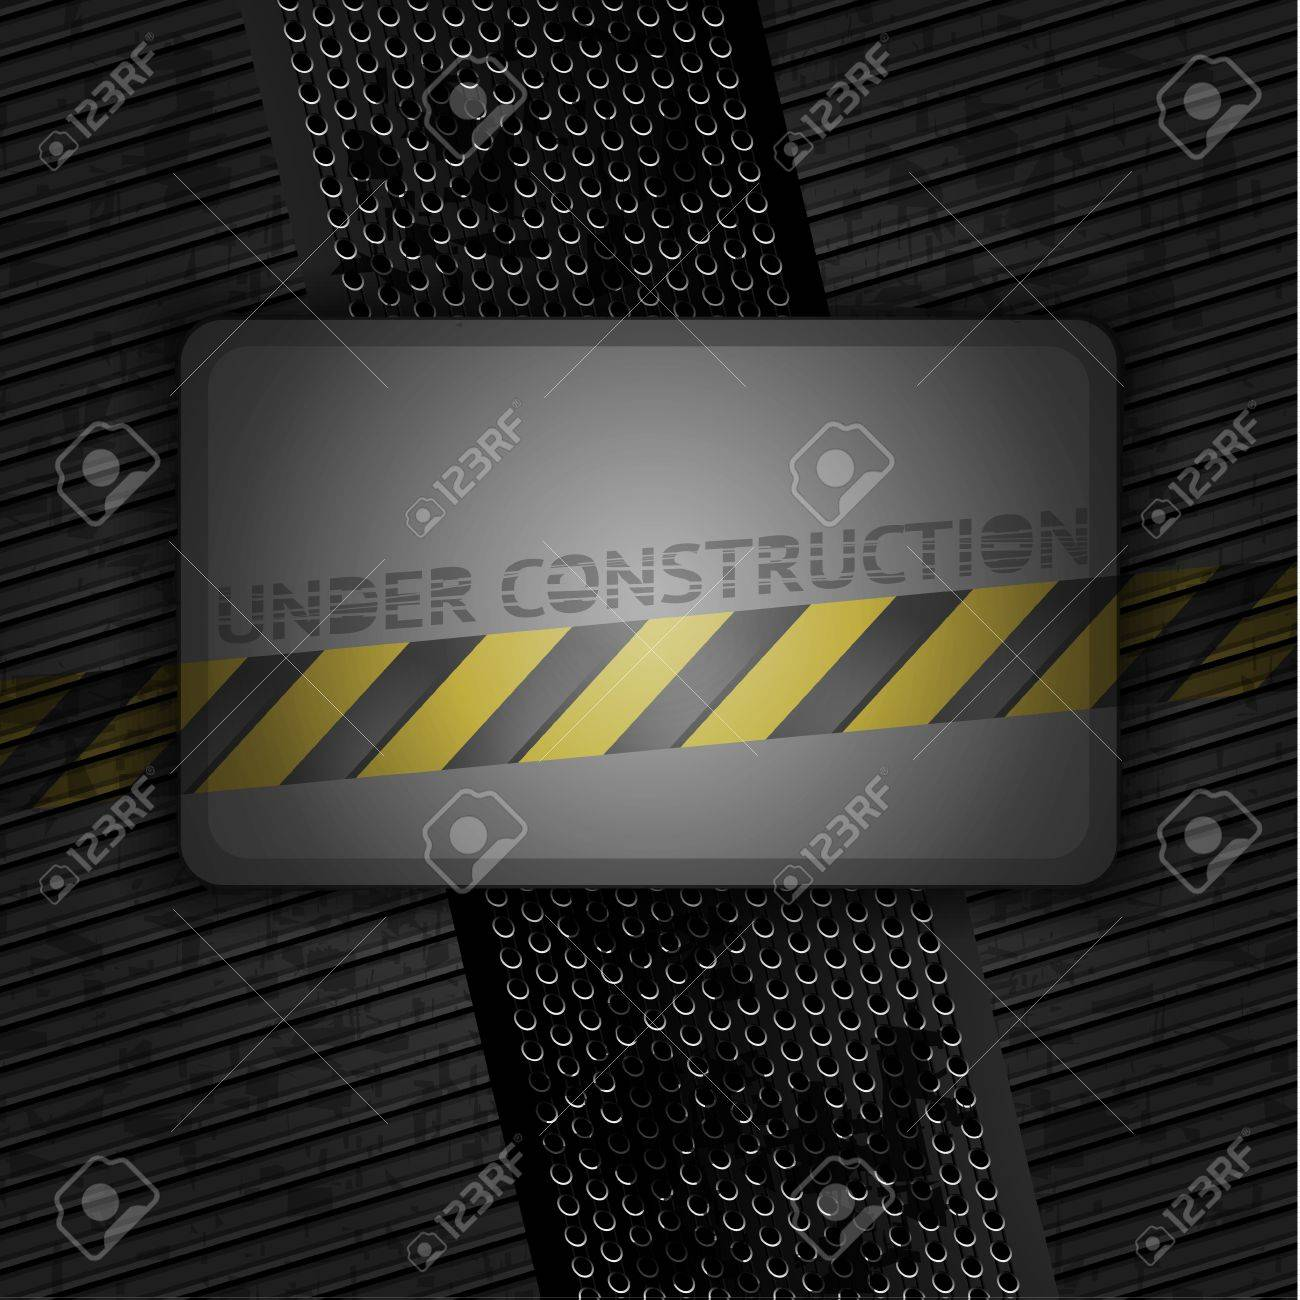 Metallic grunge background blank template  Vector 10eps Stock Vector - 12802625